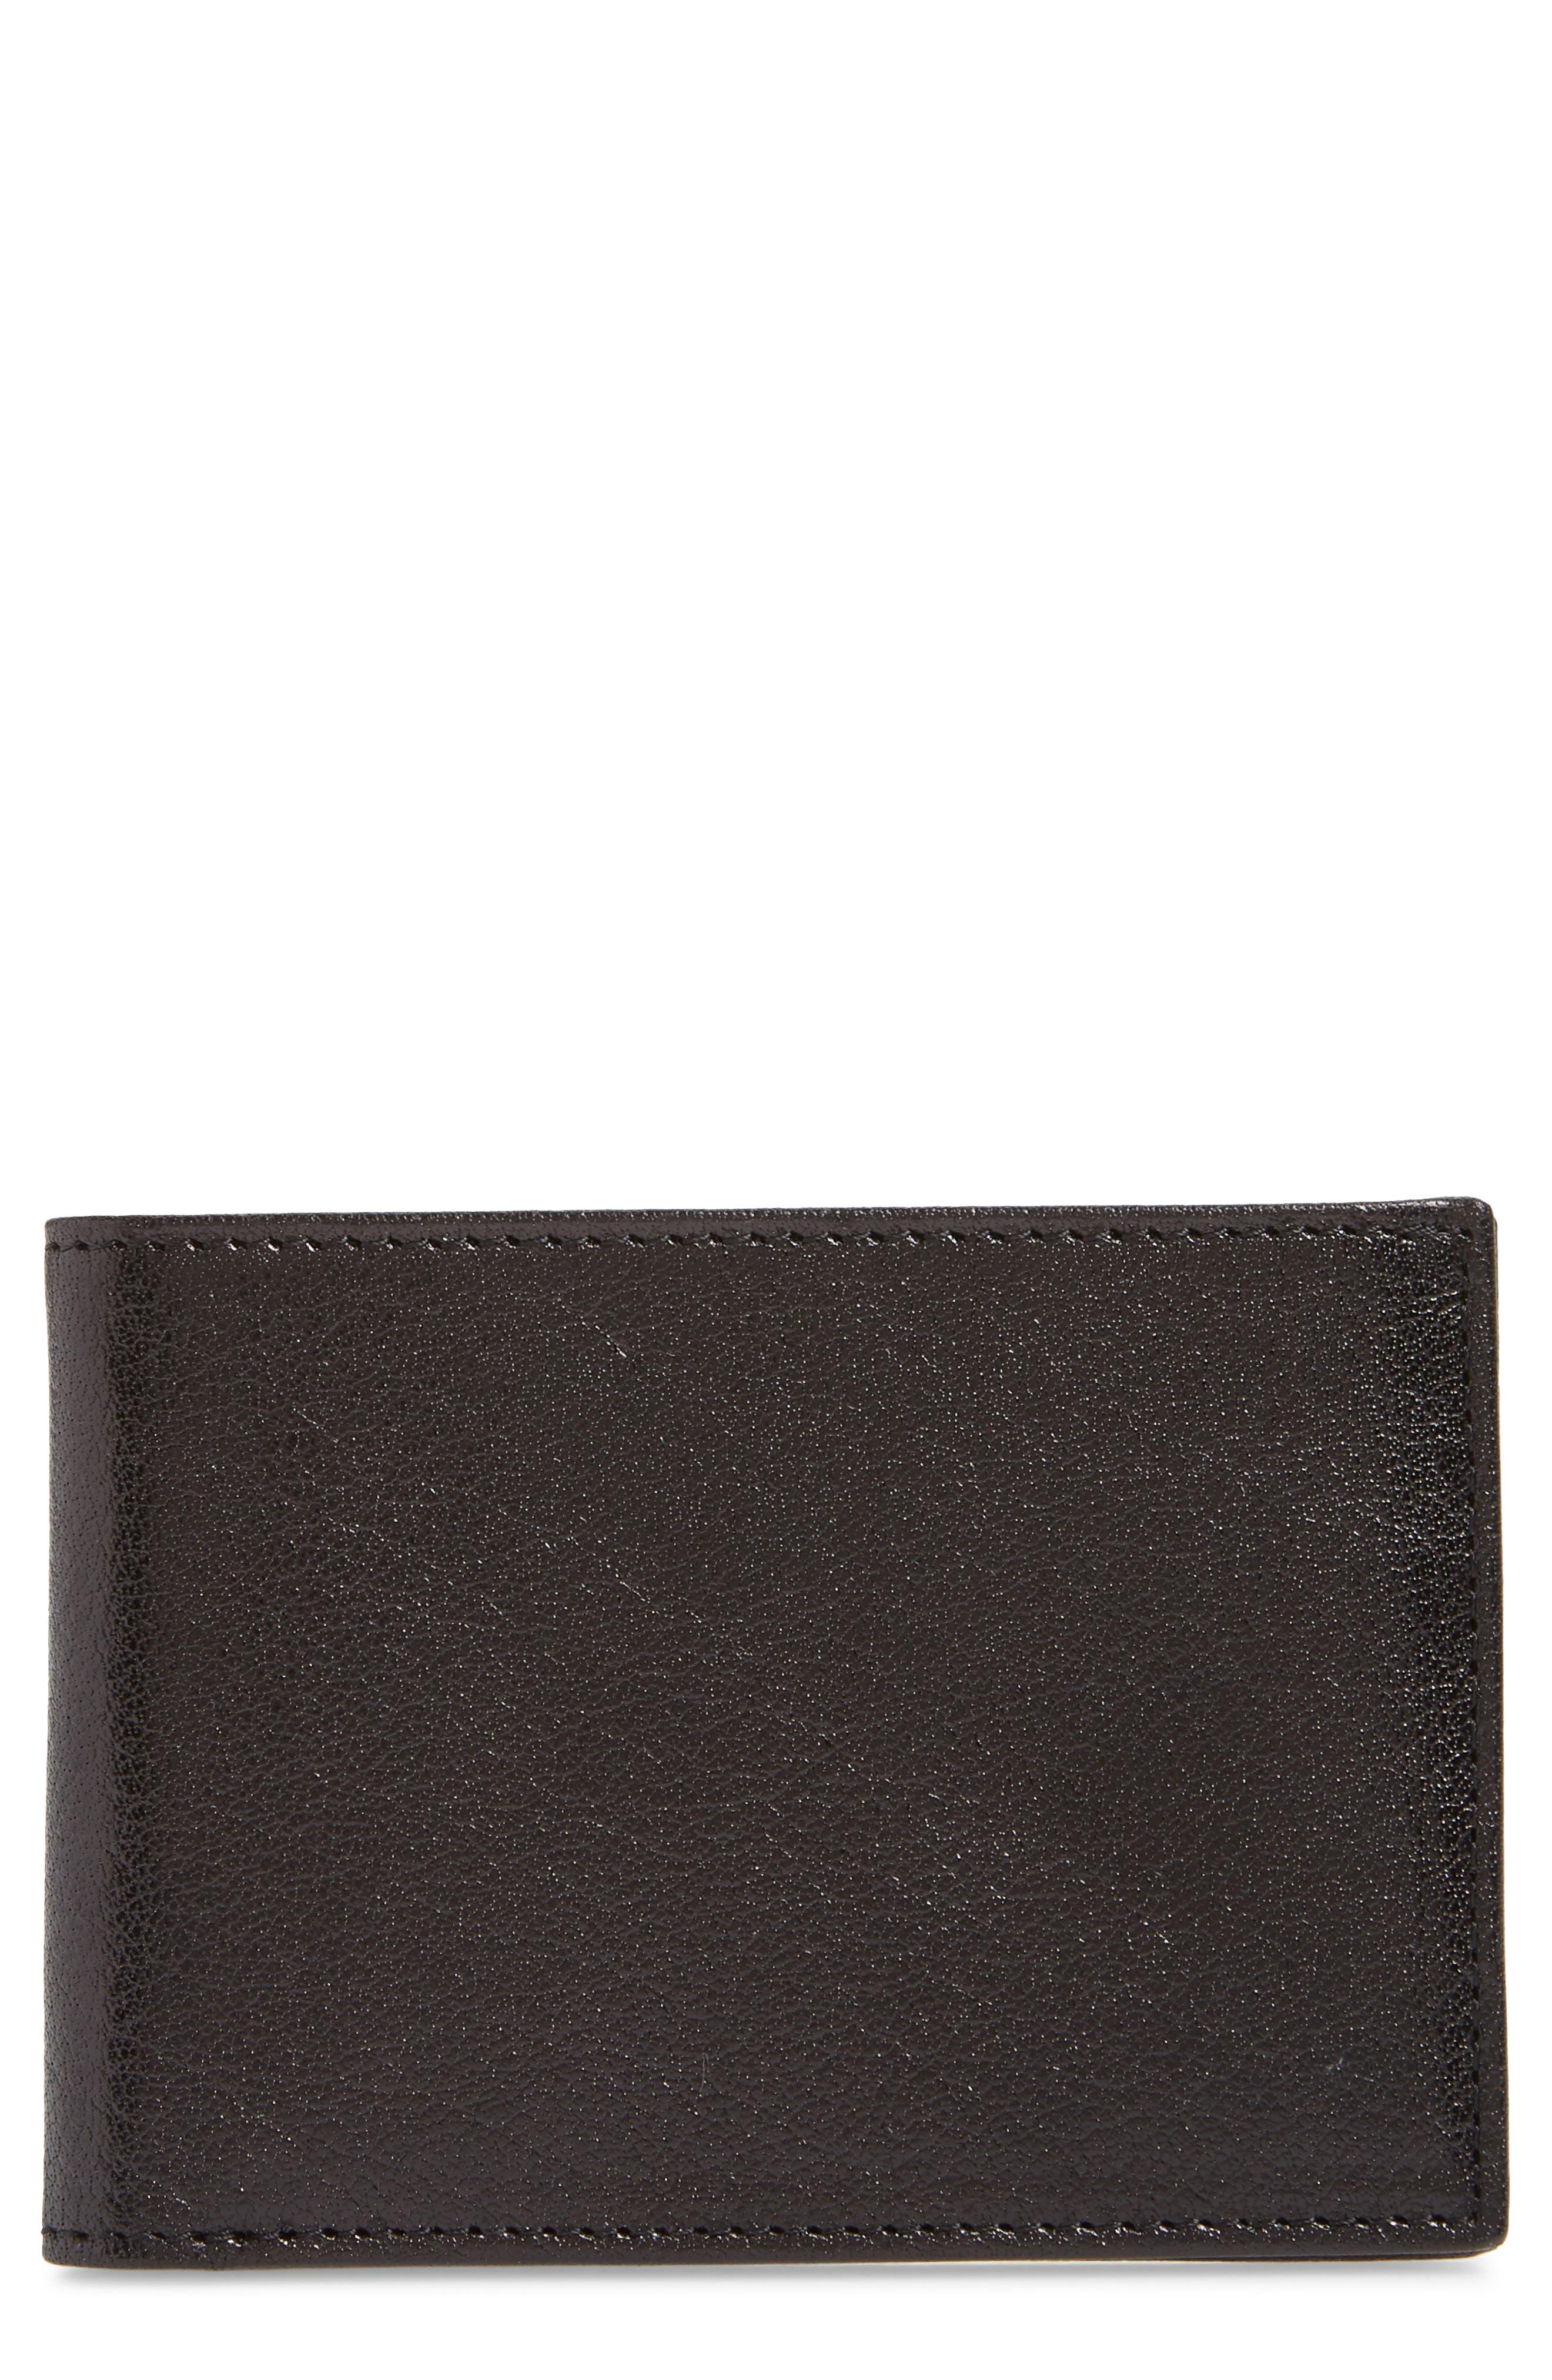 Landon Slim Leather Wallet,                         Main,                         color, 001